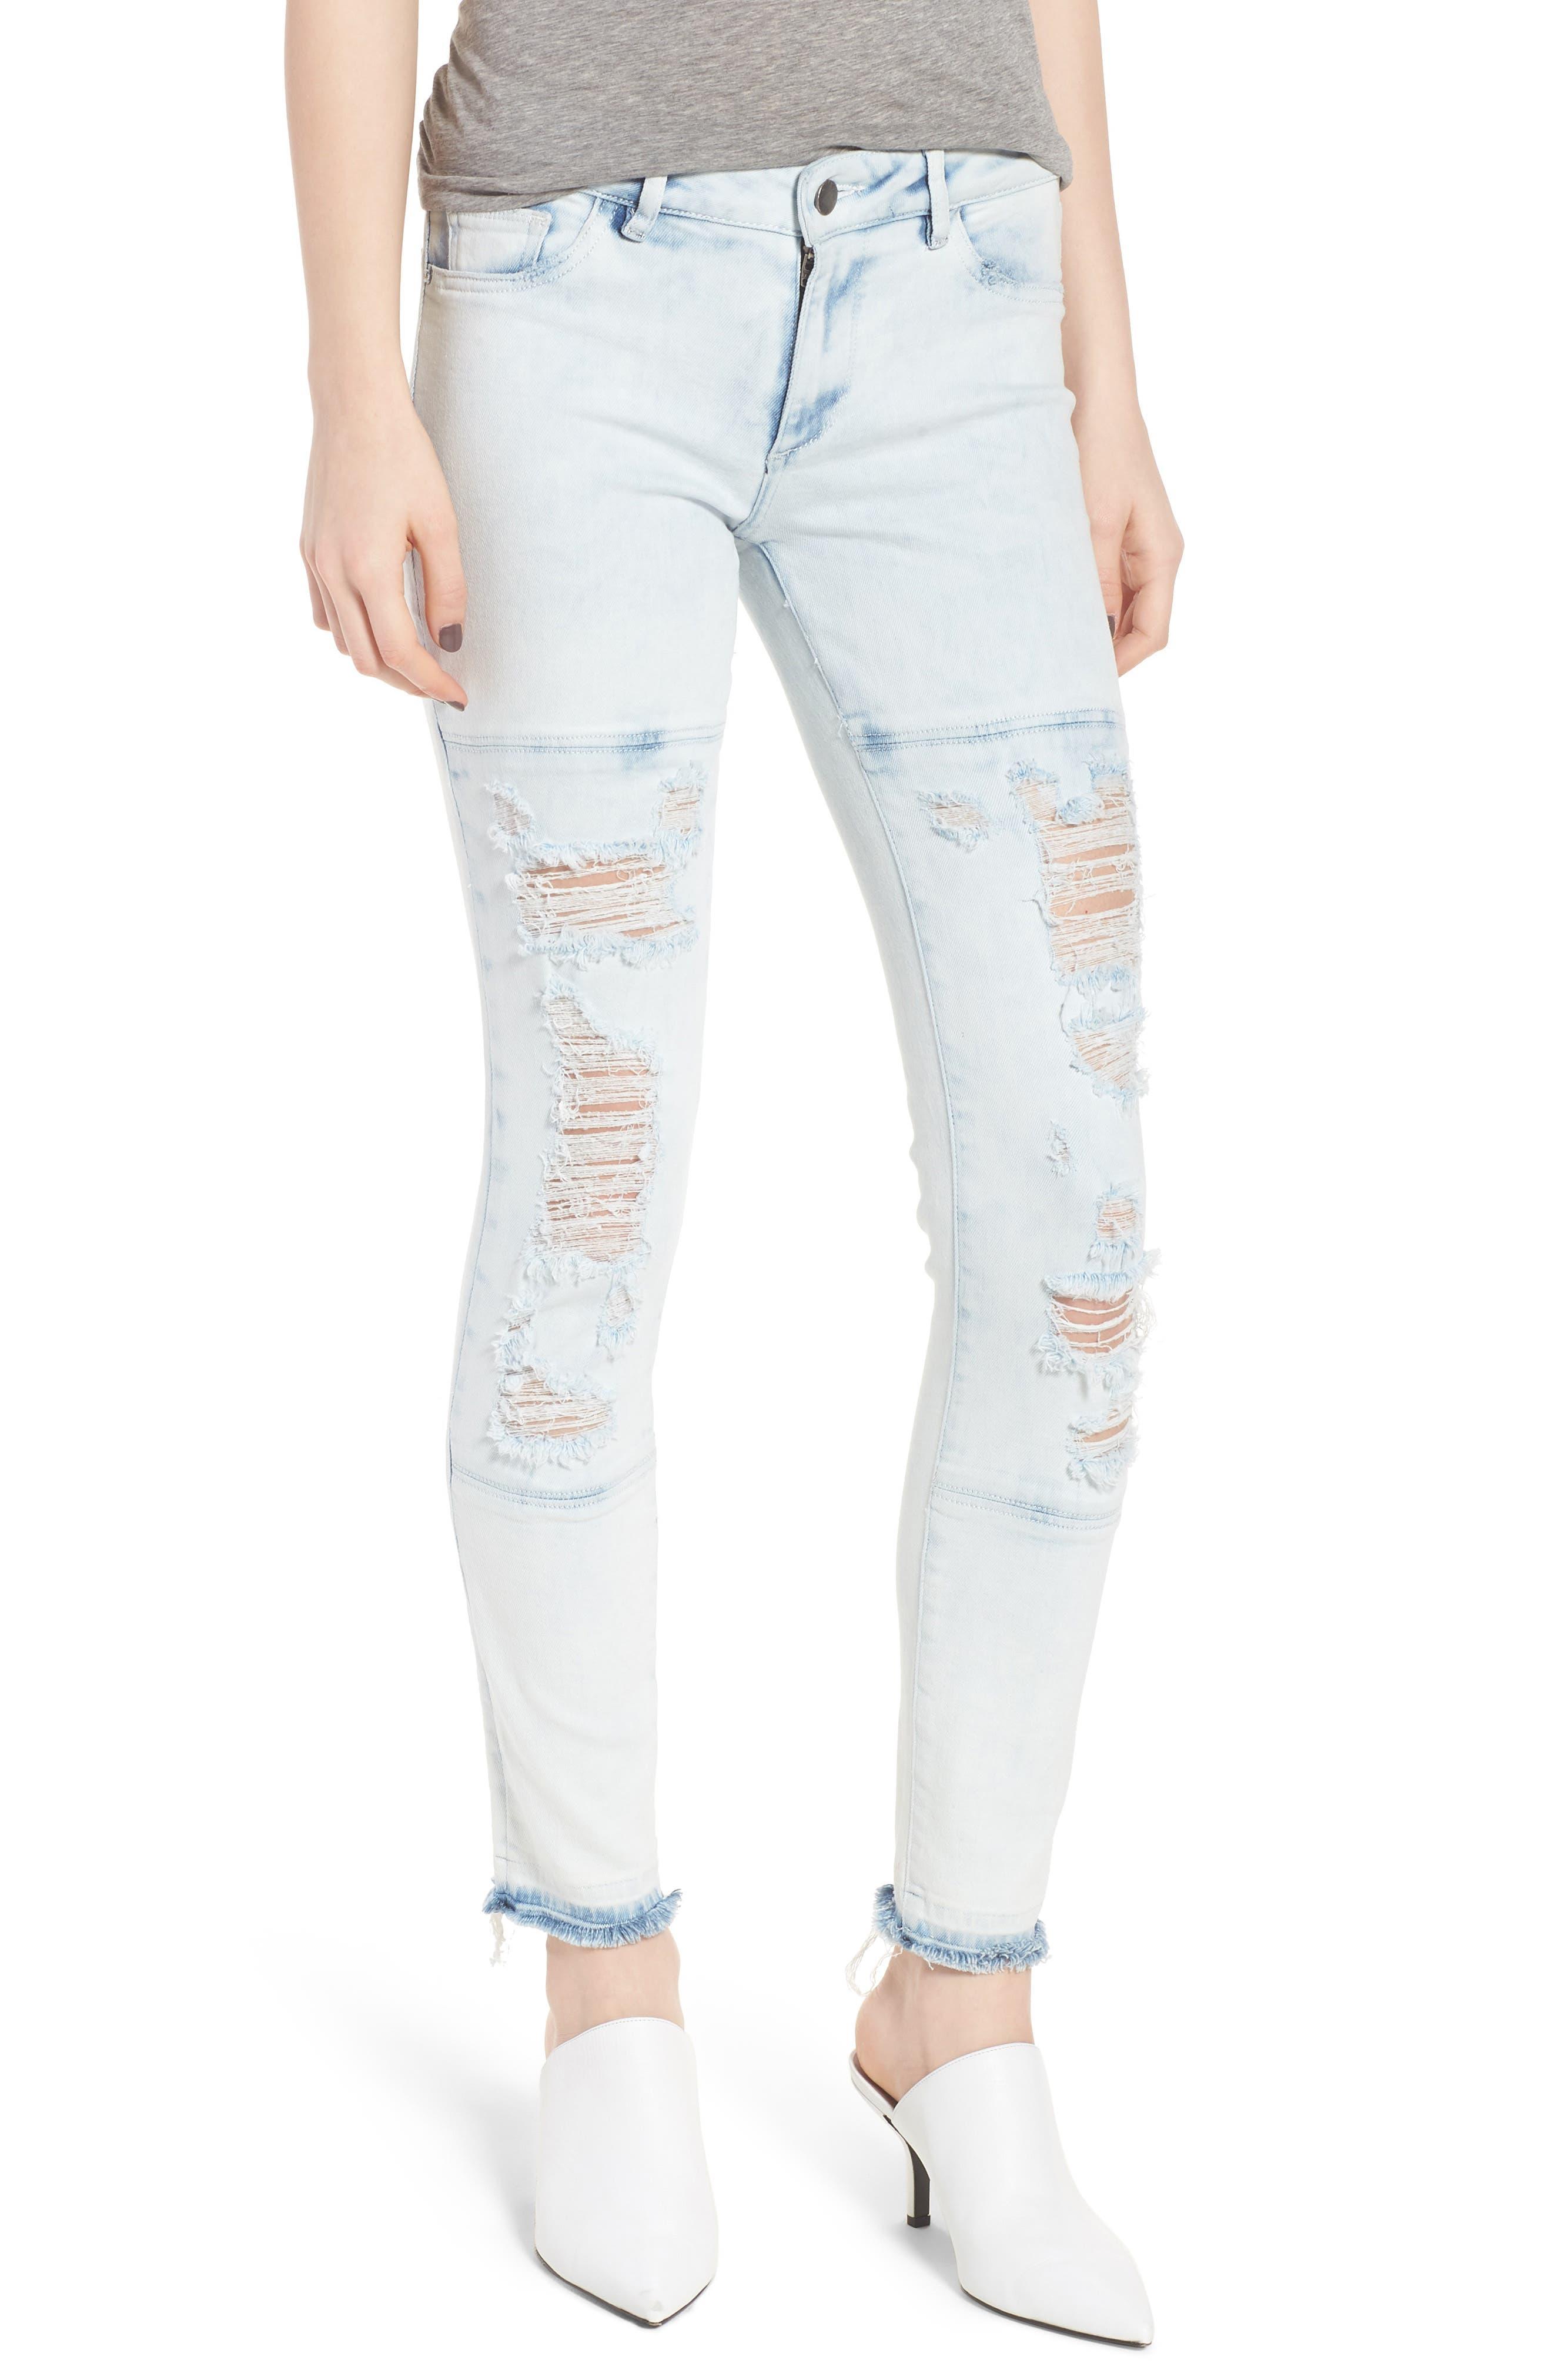 Emma Power Legging Ripped Skinny Jeans,                             Main thumbnail 1, color,                             020